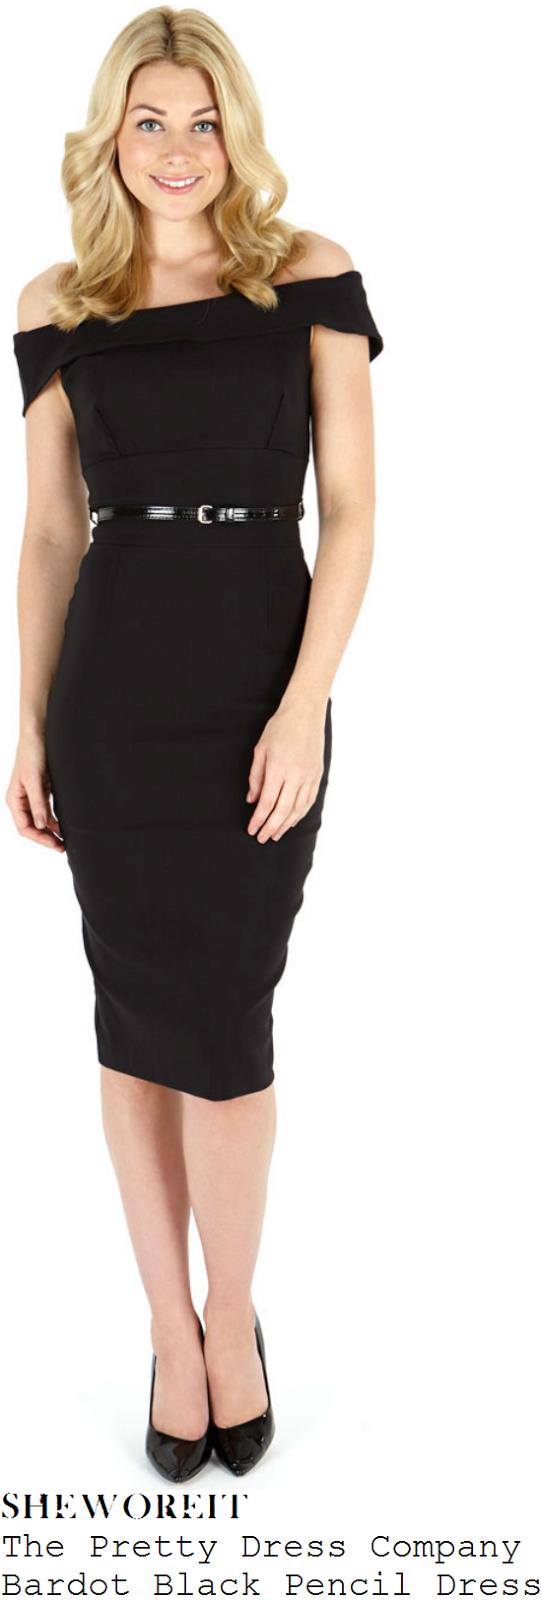 catherine-tyldesley-black-off-shoulder-tailored-pencil-midi-dress-bingo